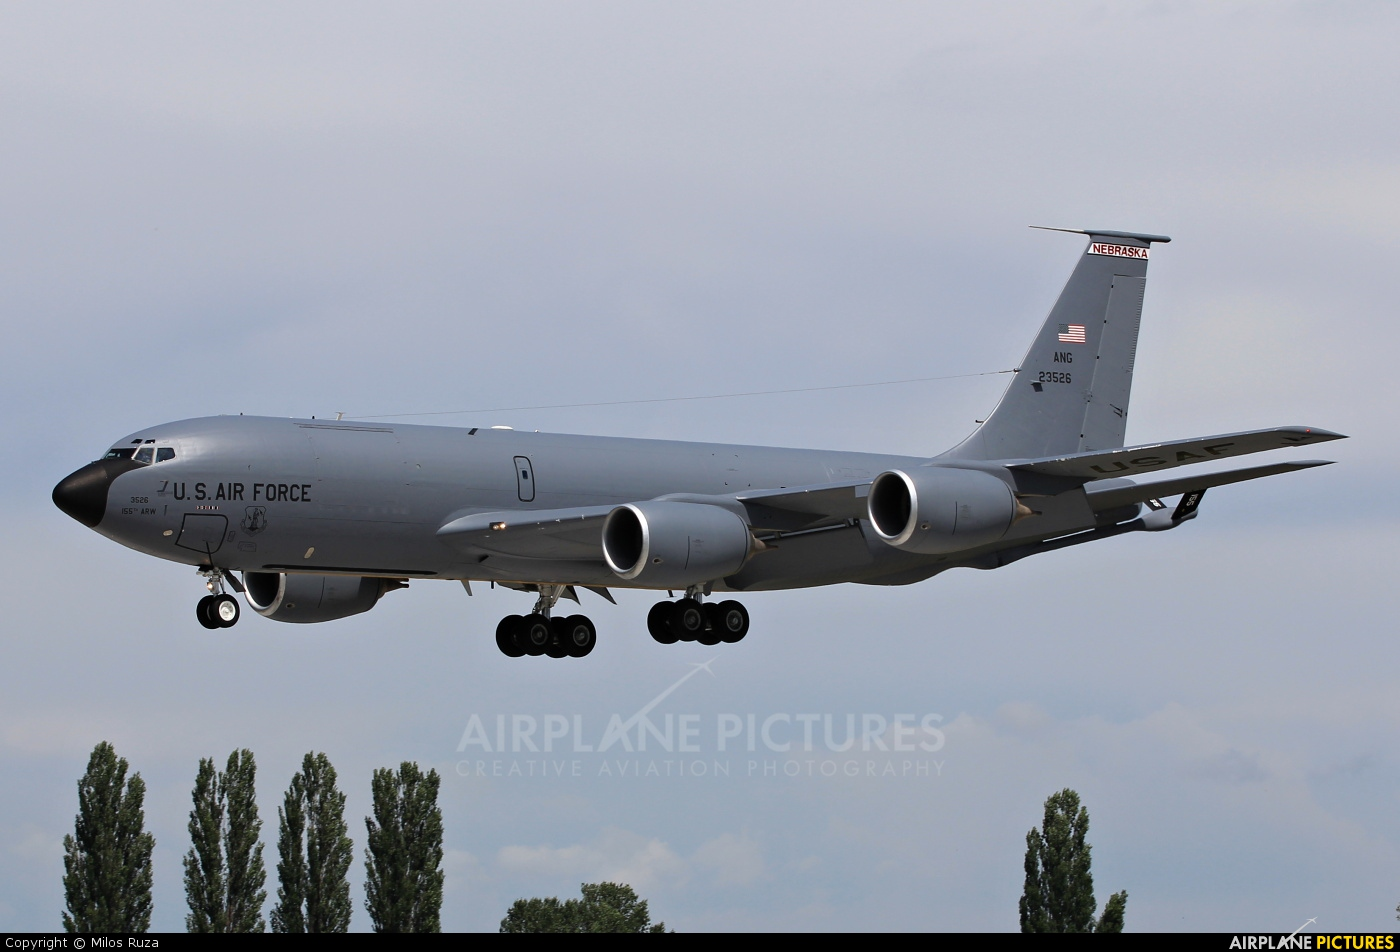 USA - Air Force 62-3526 aircraft at Pardubice